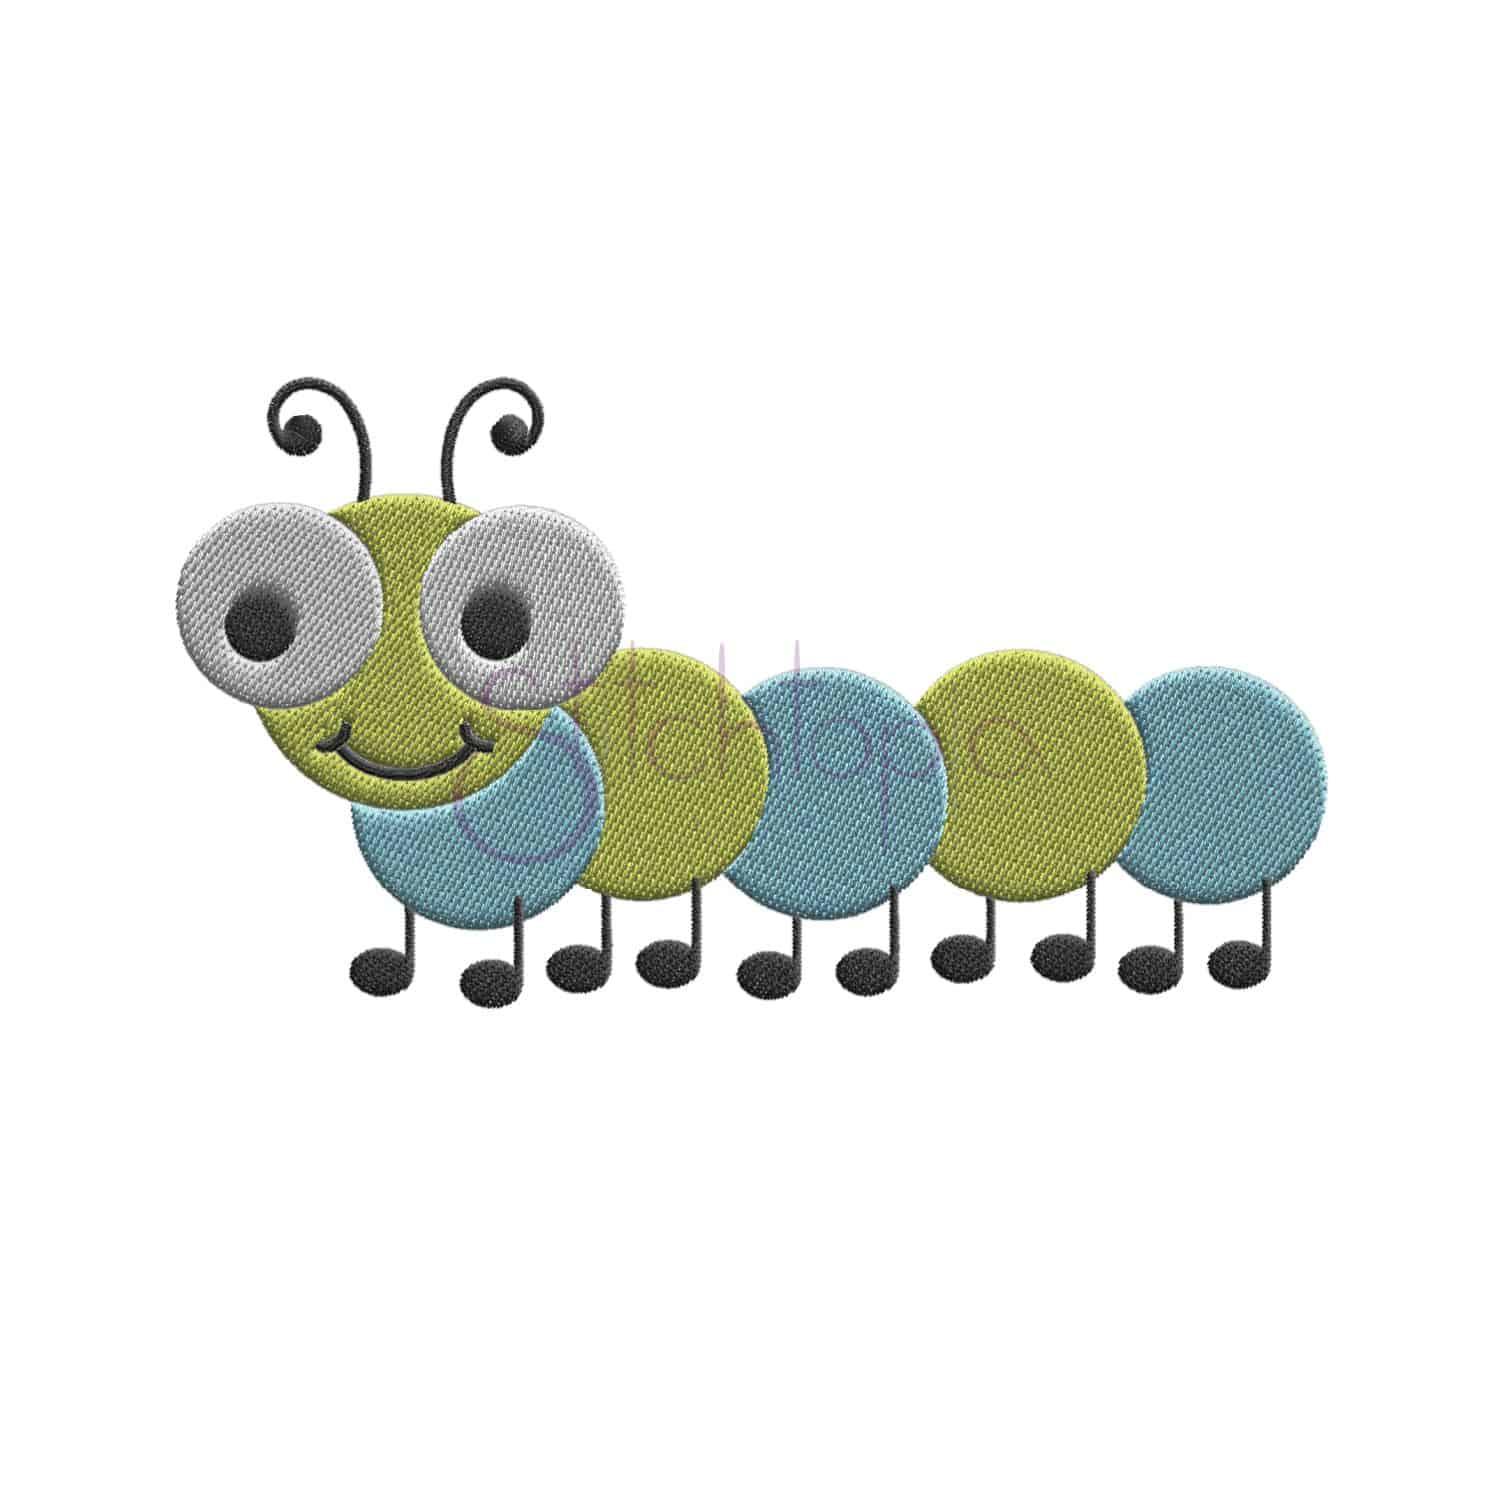 Cute Bugs Caterpillar Embroidery Design Stitchtopia